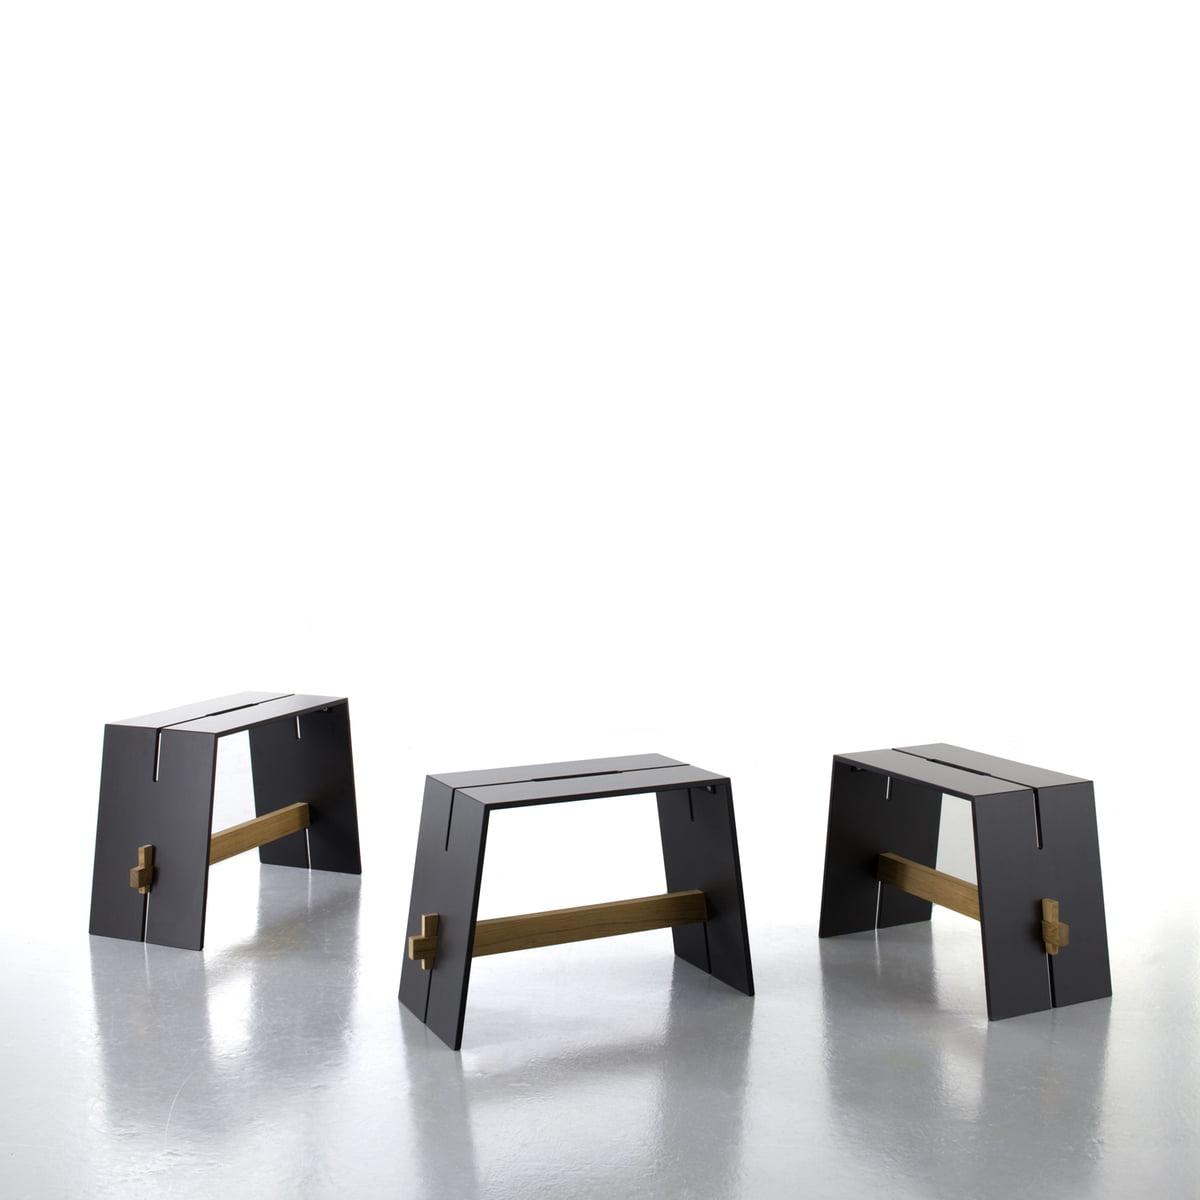 Conmoto - Tension Side Table u0026 Stool  sc 1 st  Connox & Tension Side Table u0026 Stool by Conmoto islam-shia.org